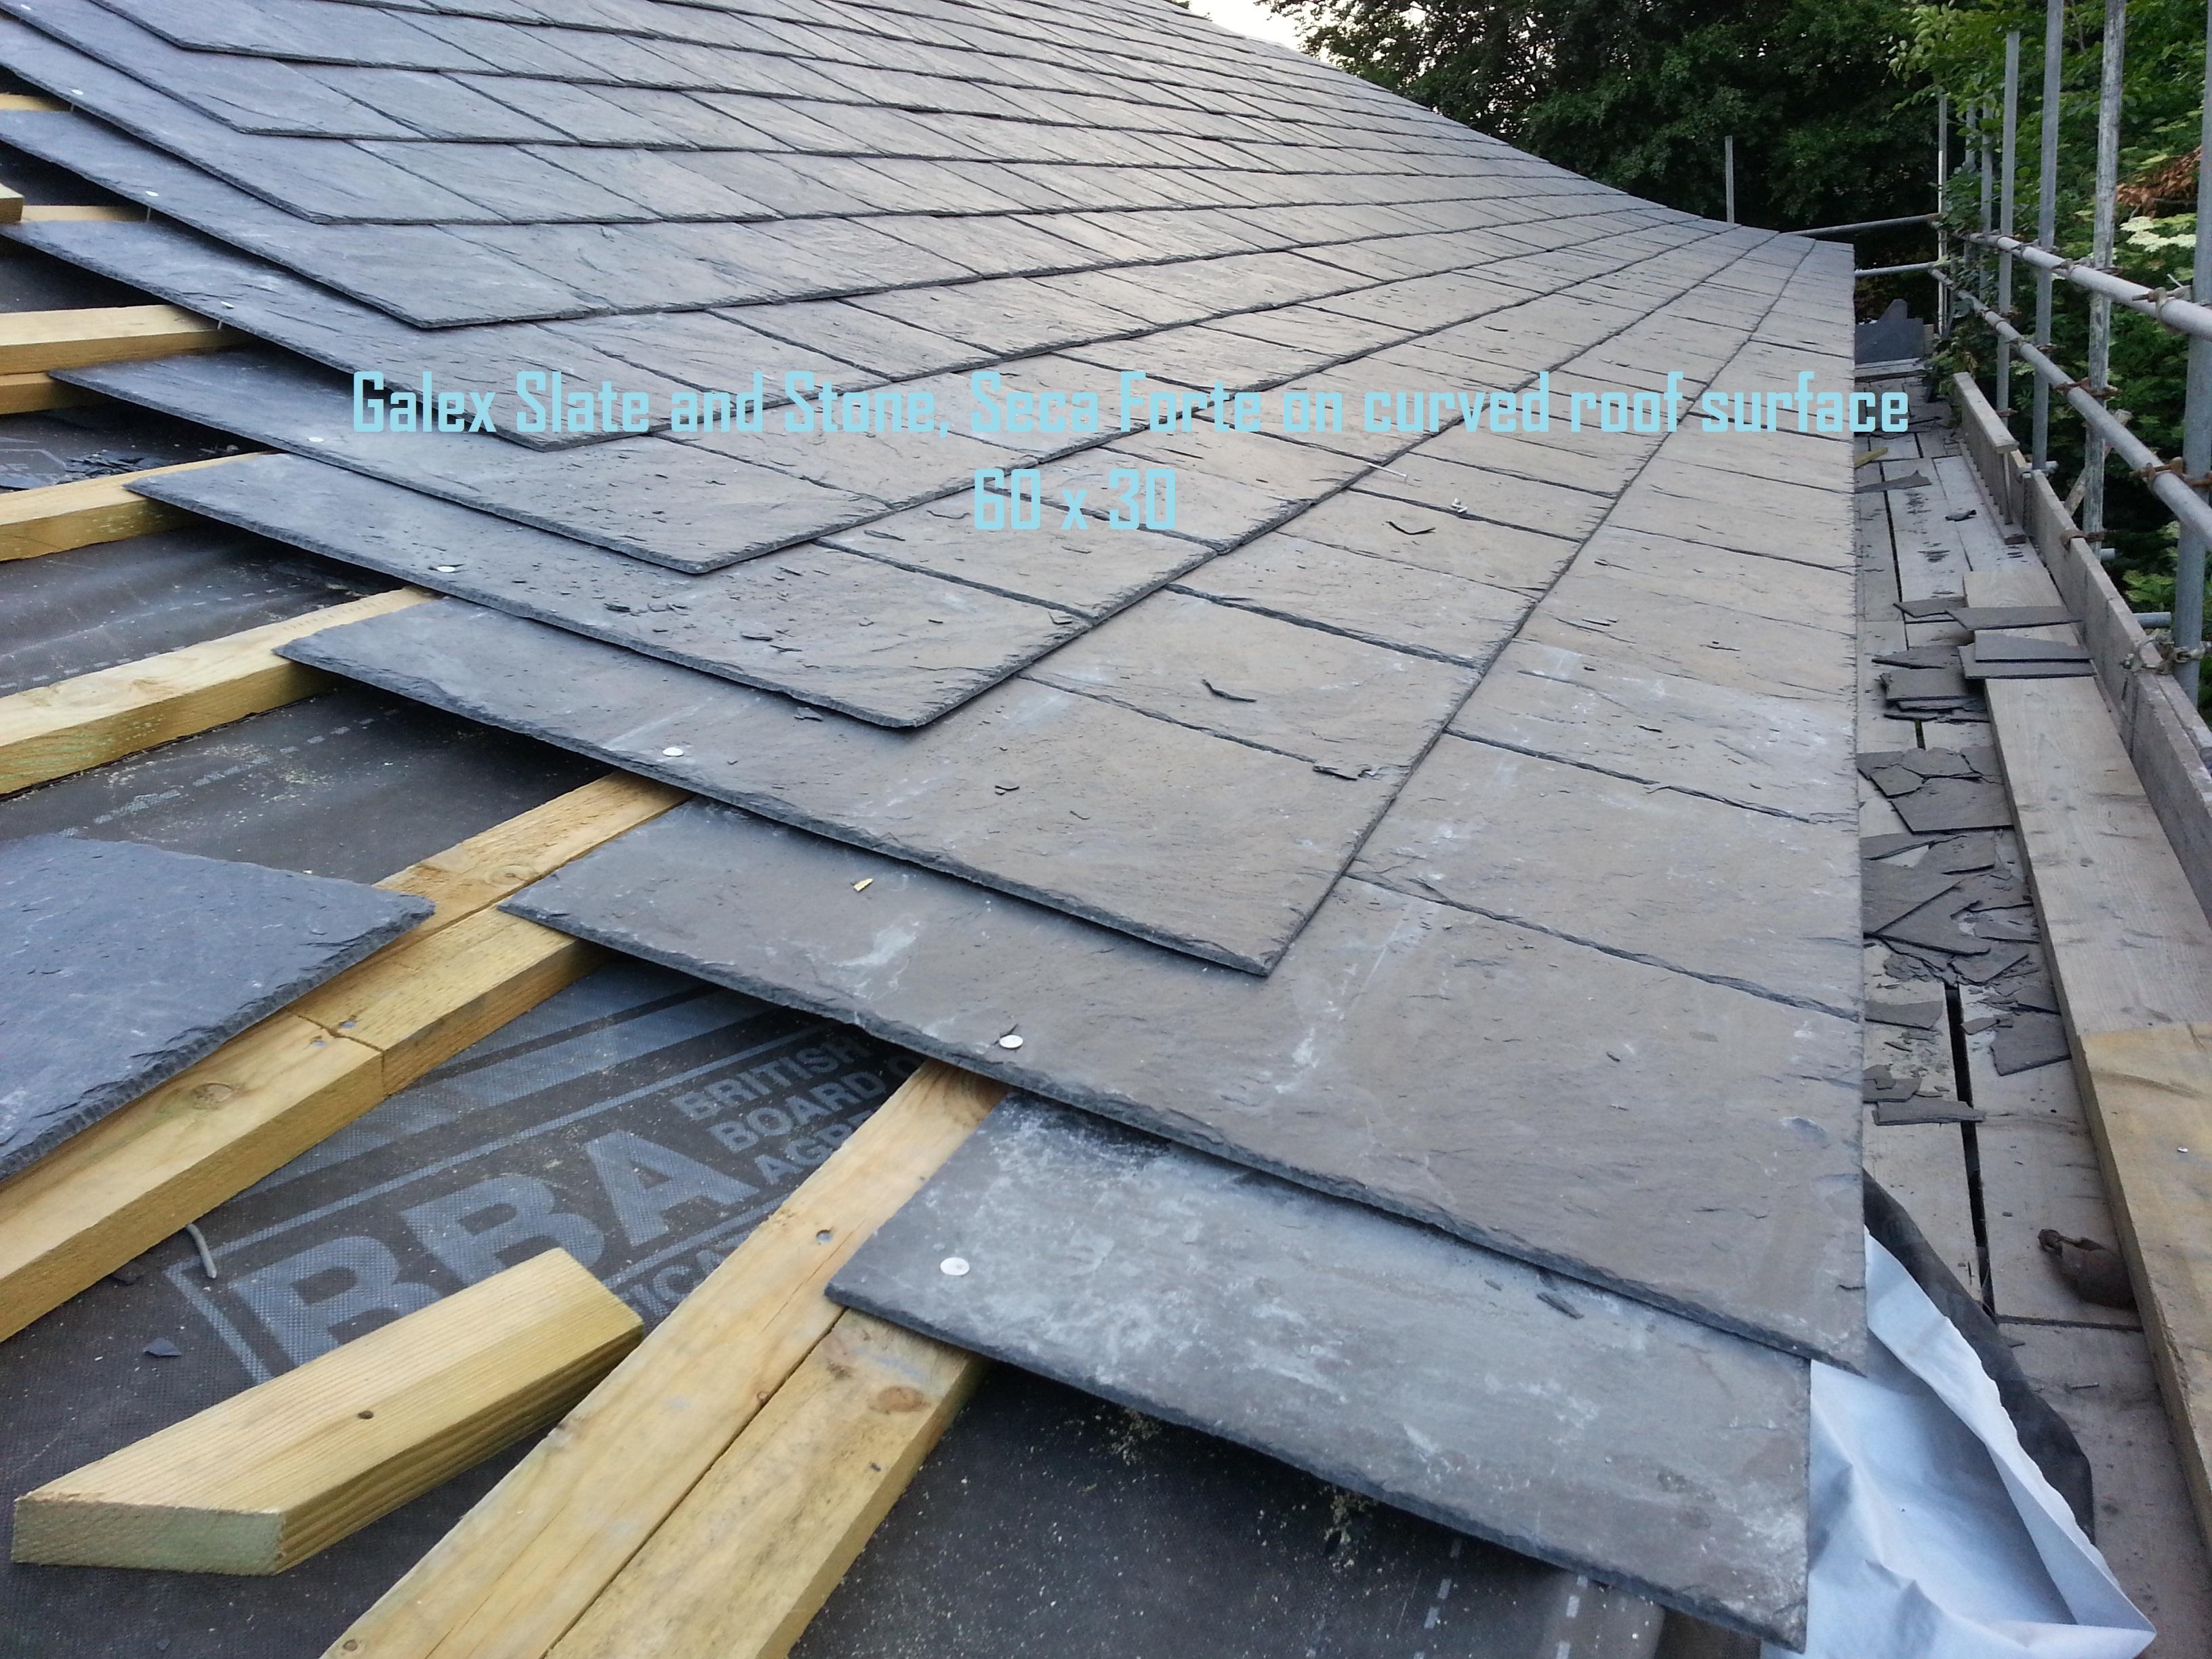 Galex Spanish Roofing Slate